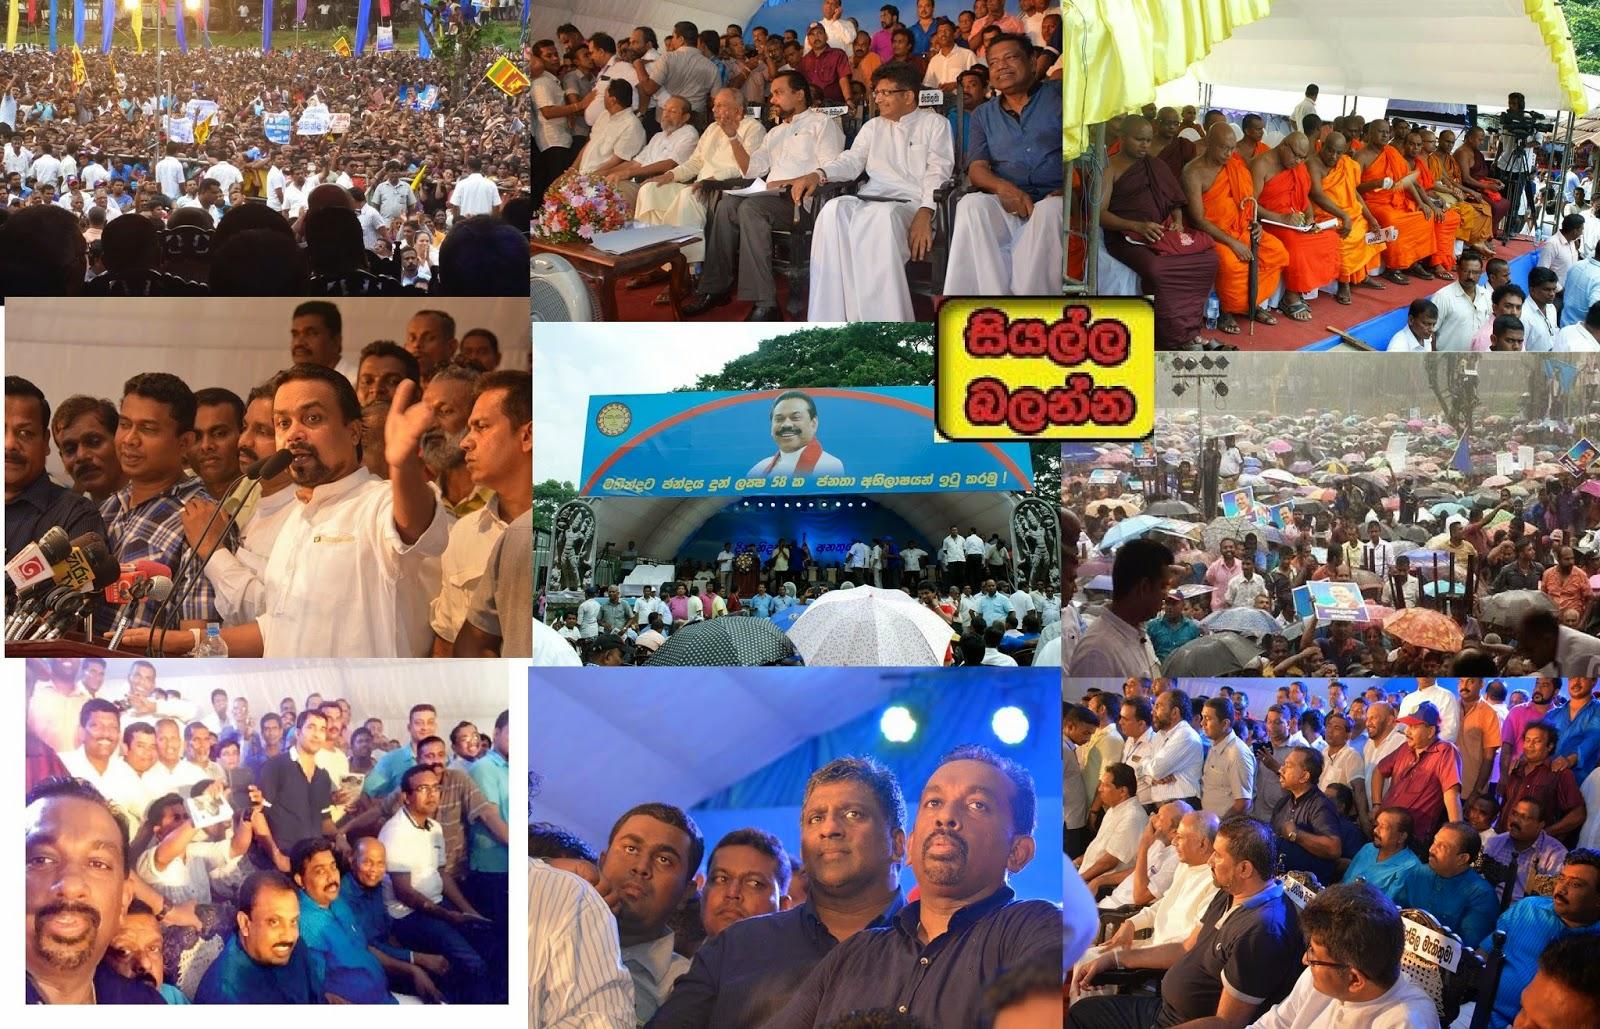 http://picture.gossiplankahotnews.com/2015/03/bring-back-mahinda-rally-in-ratnapura.html